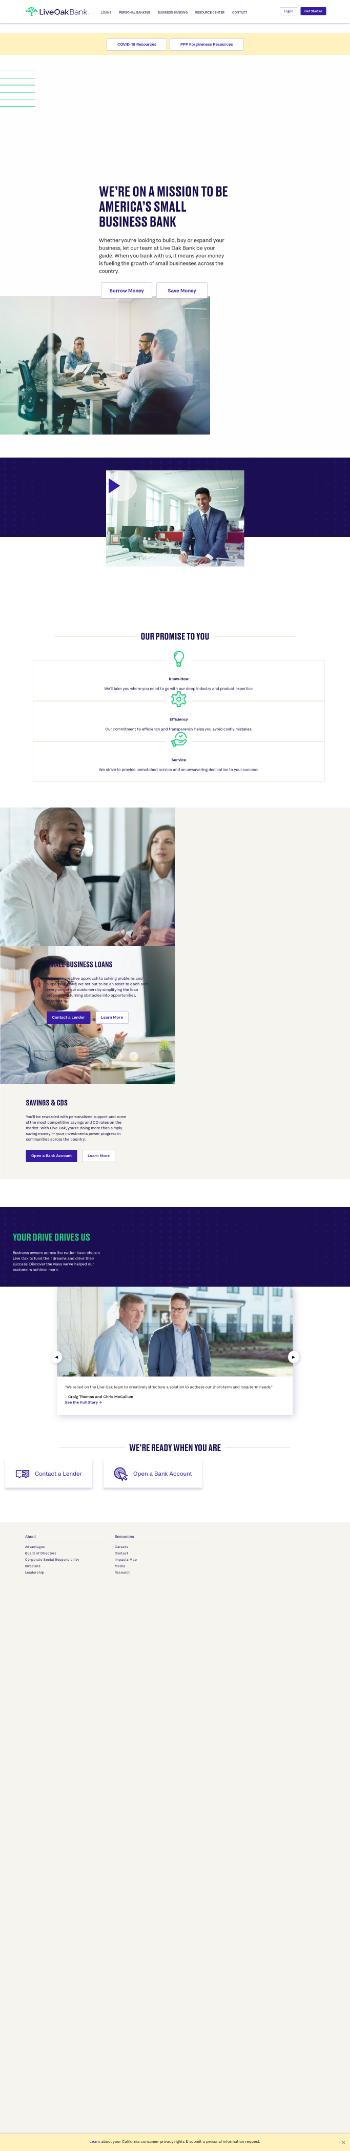 Live Oak Bancshares, Inc. Website Screenshot